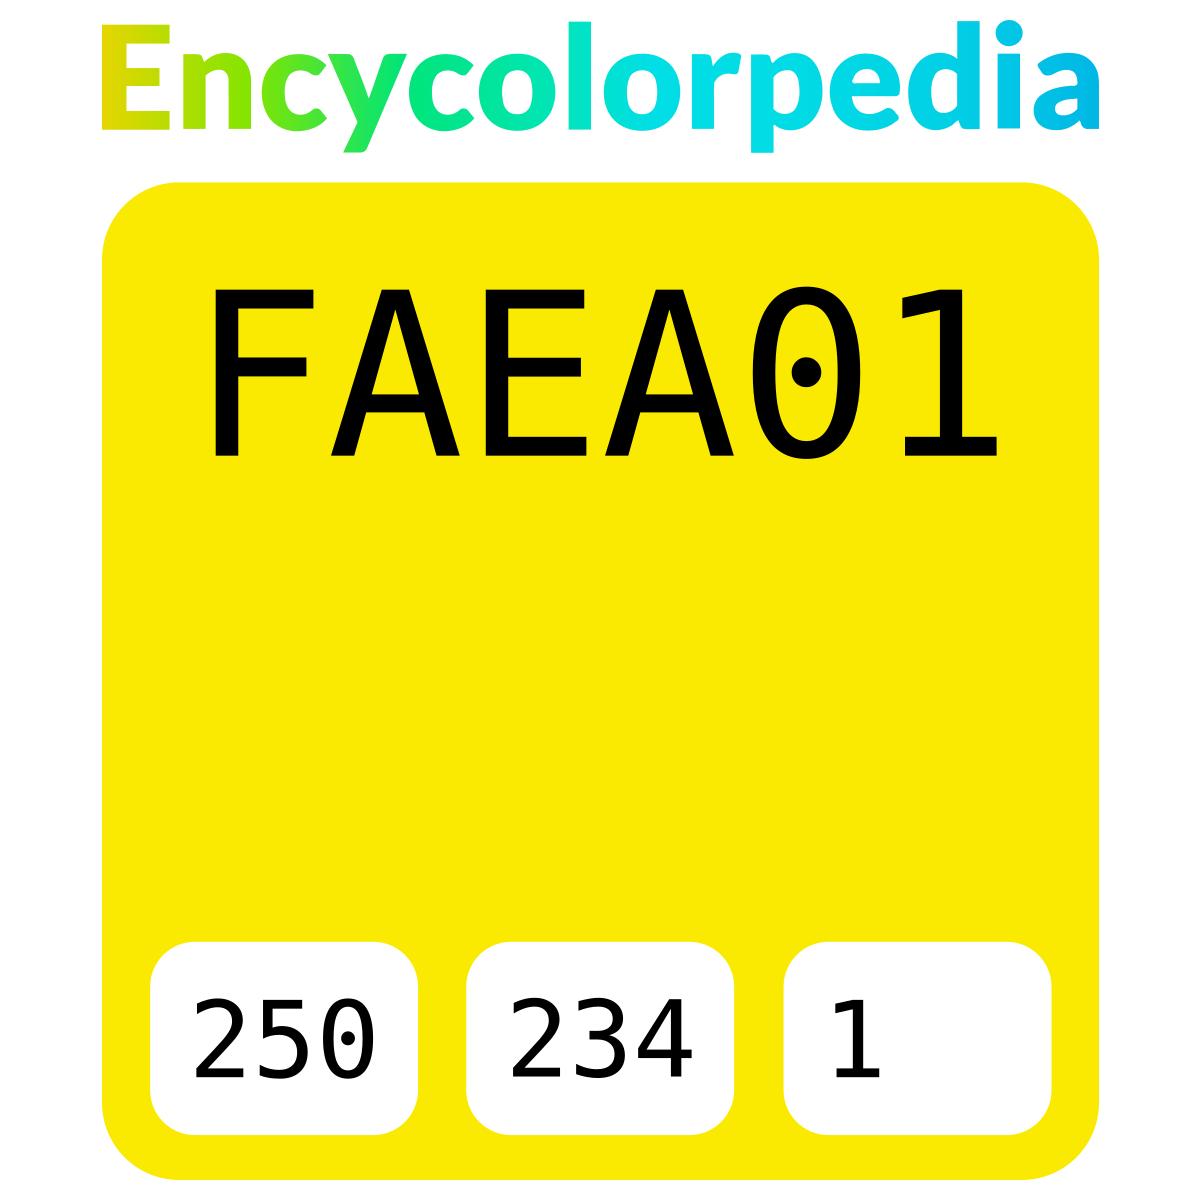 Faea01 Renk Sema Kodlari Ve Boyalar